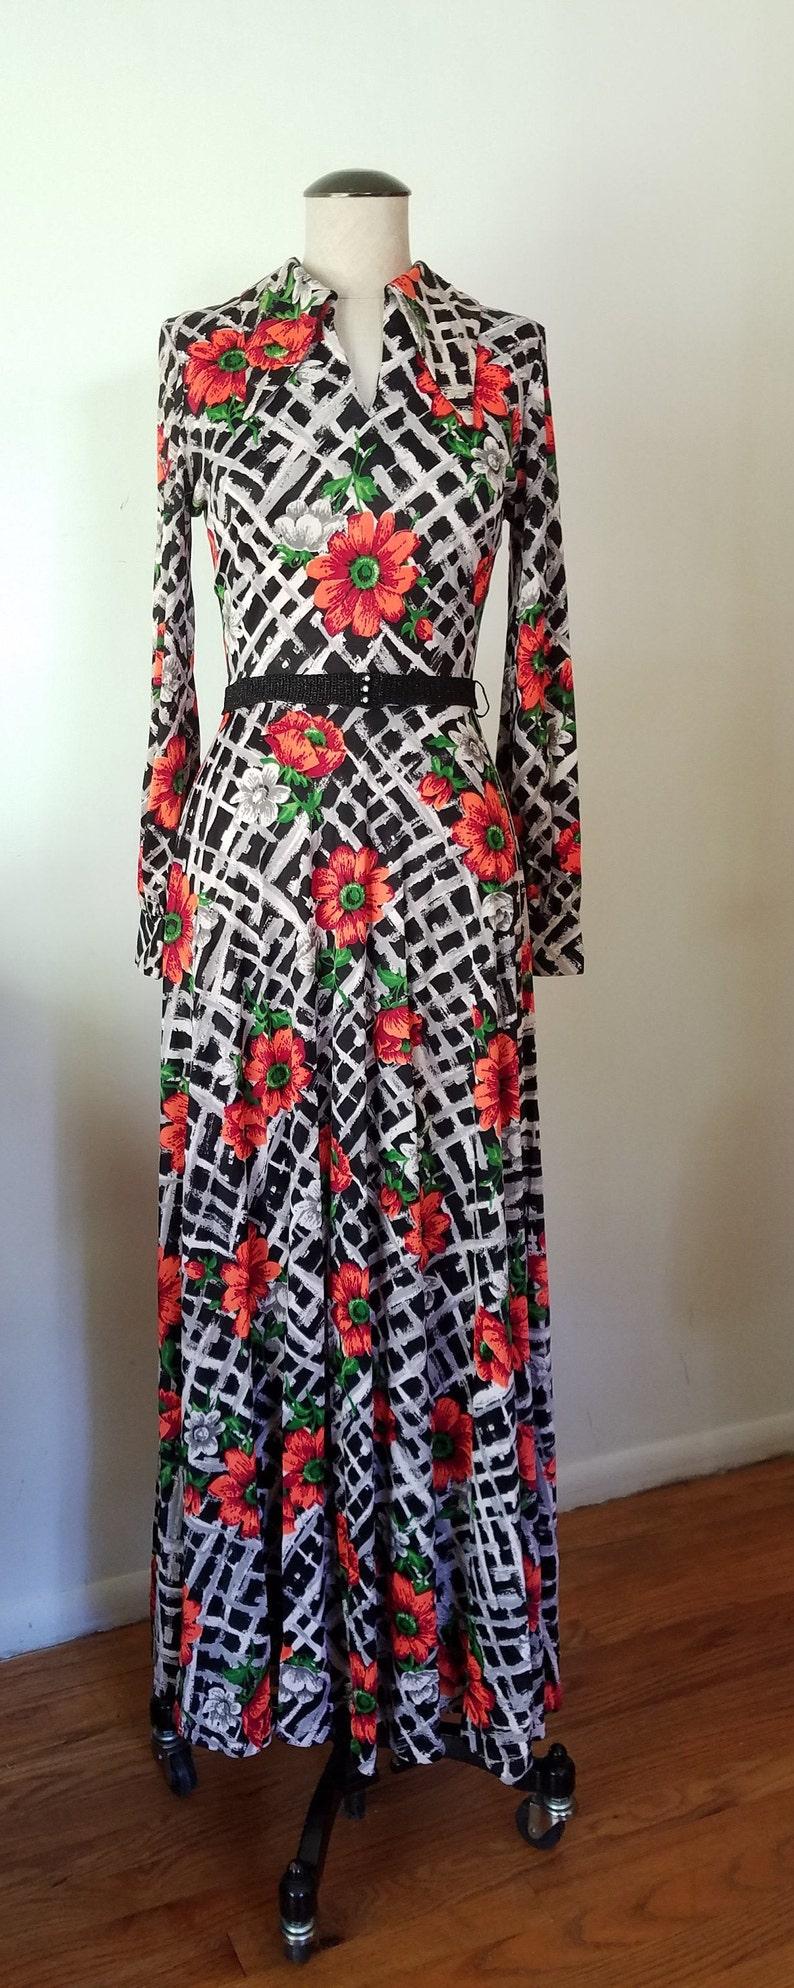 Black Friday vintage floral checkered dress